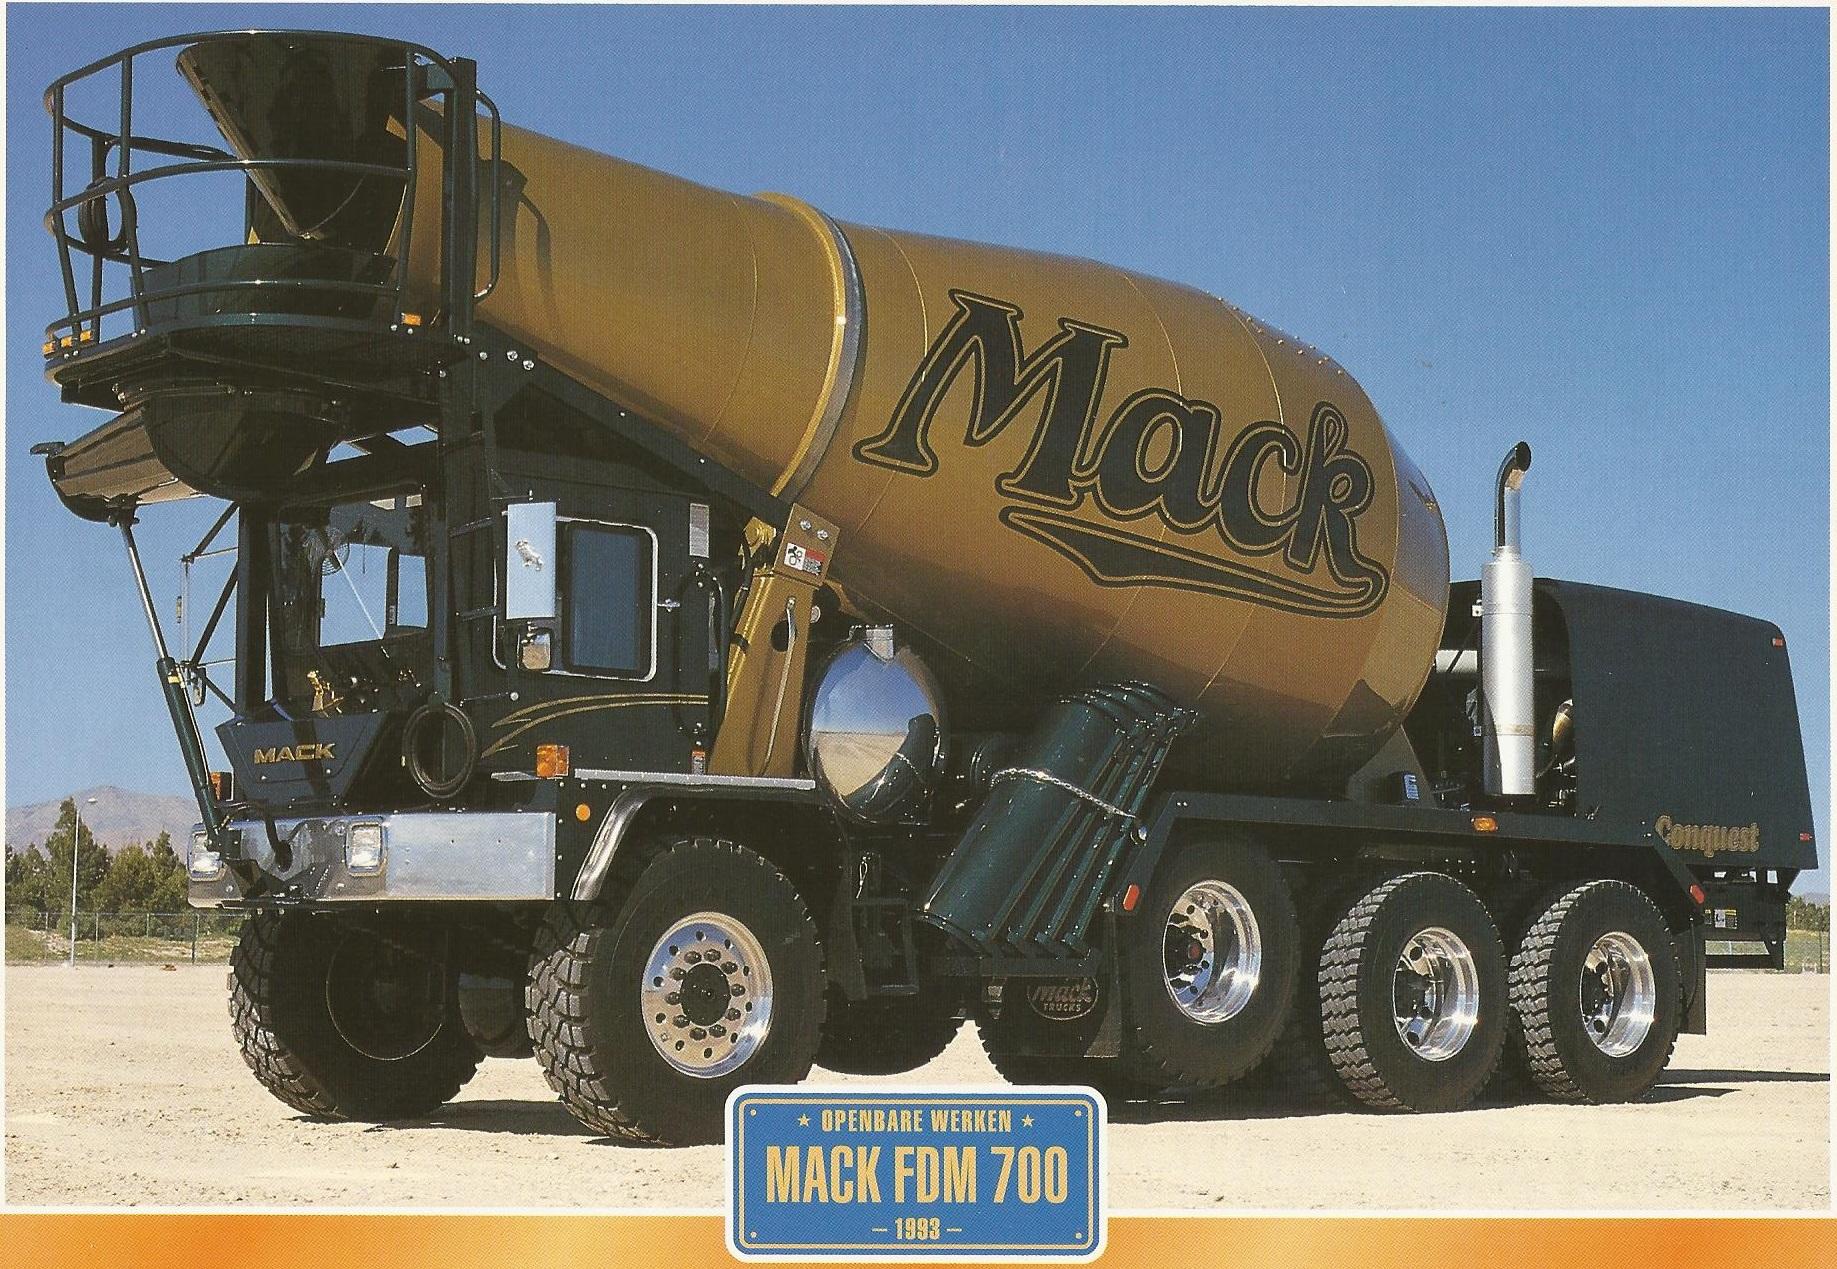 Mack-B-001